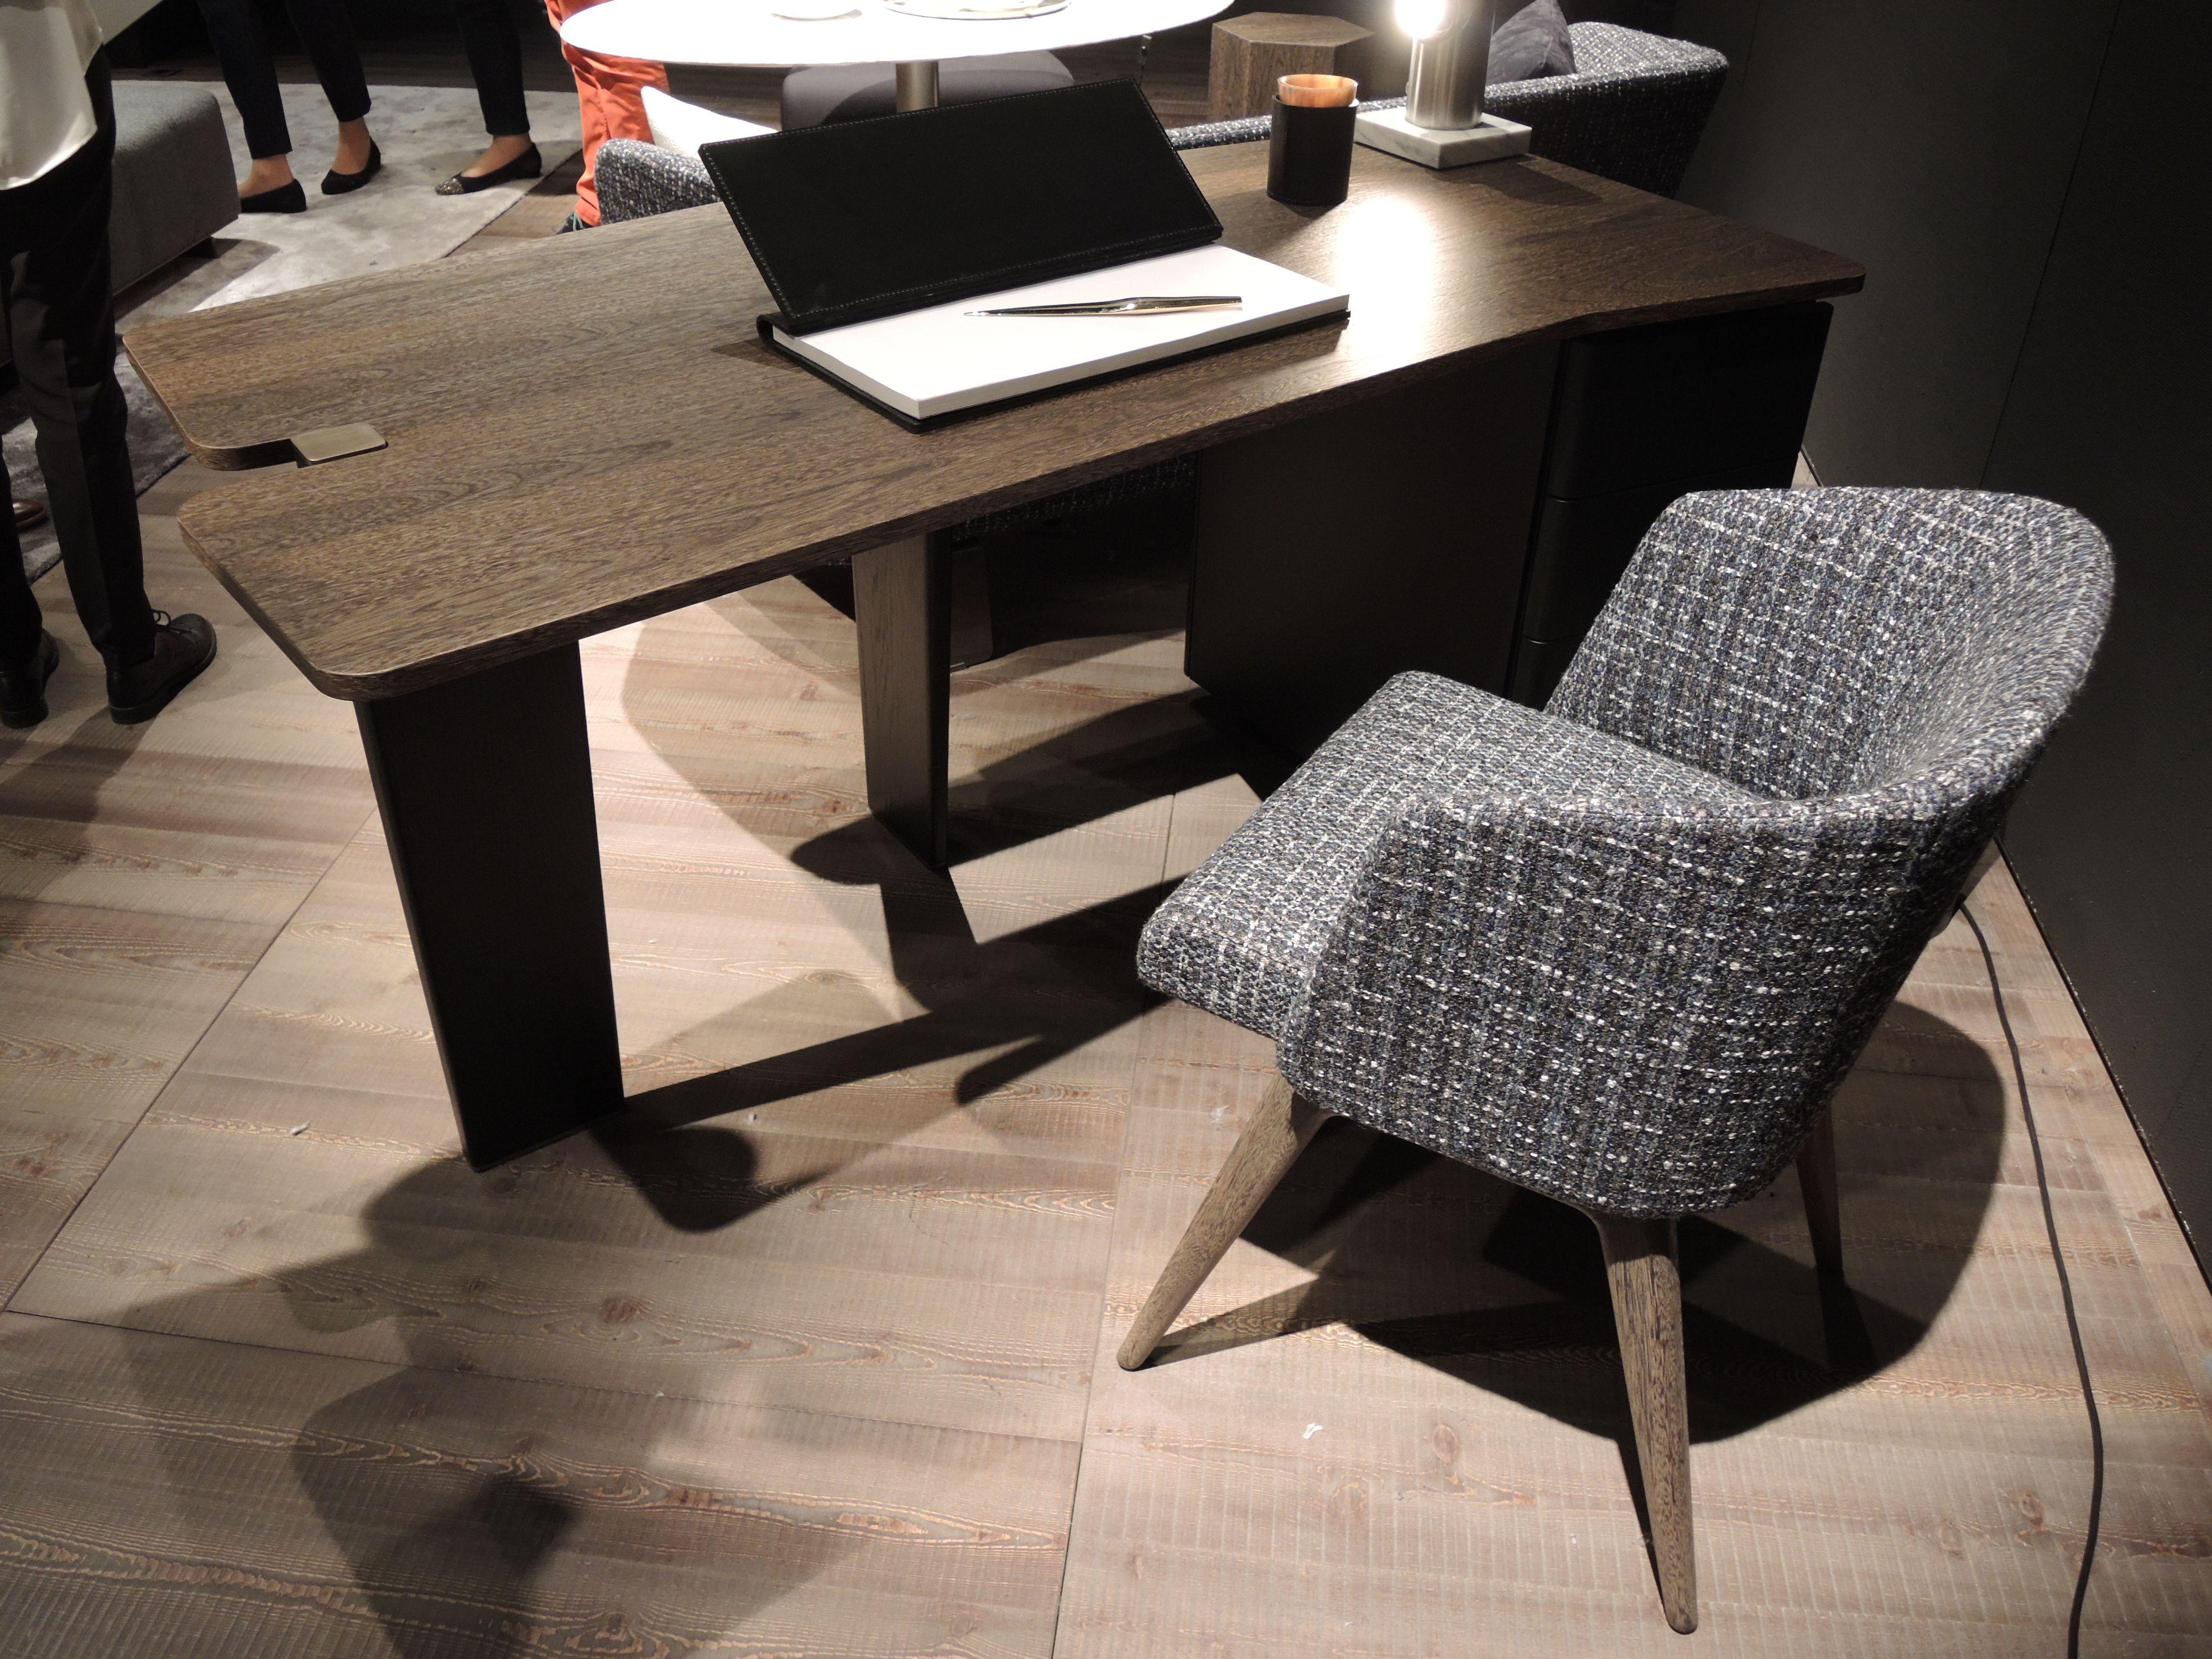 MINOTTI Isaloni Desk Chair 2016